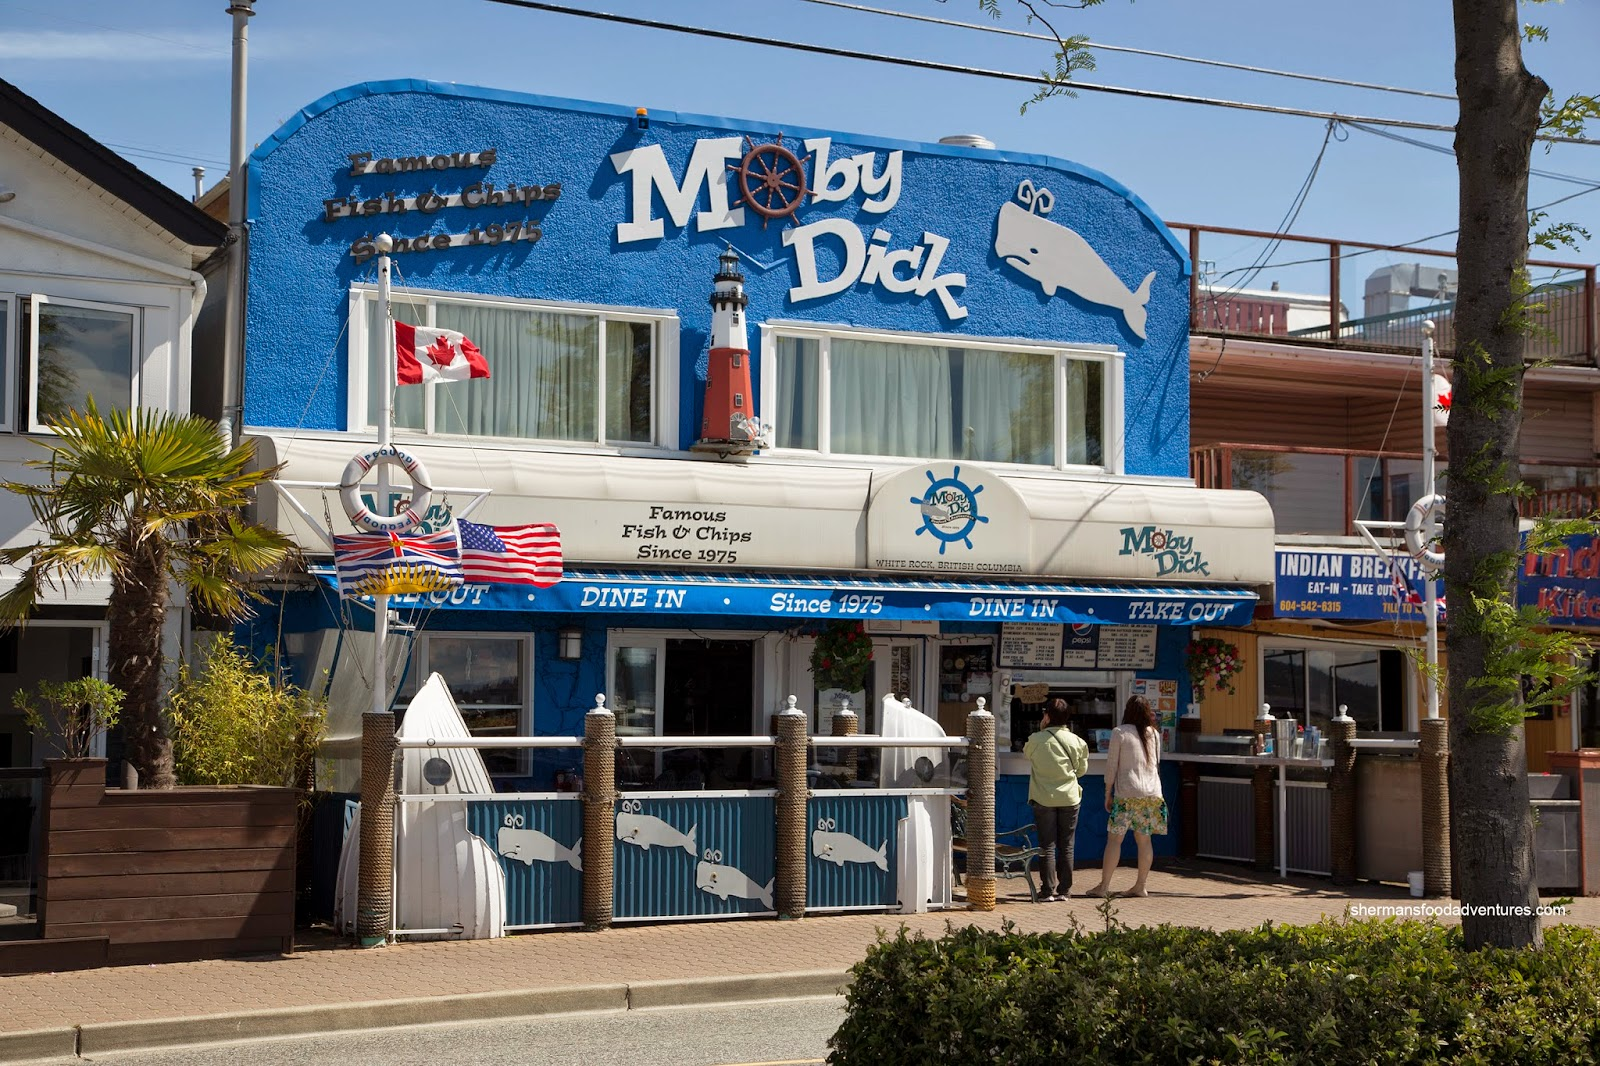 Moby dick restaurant virginia